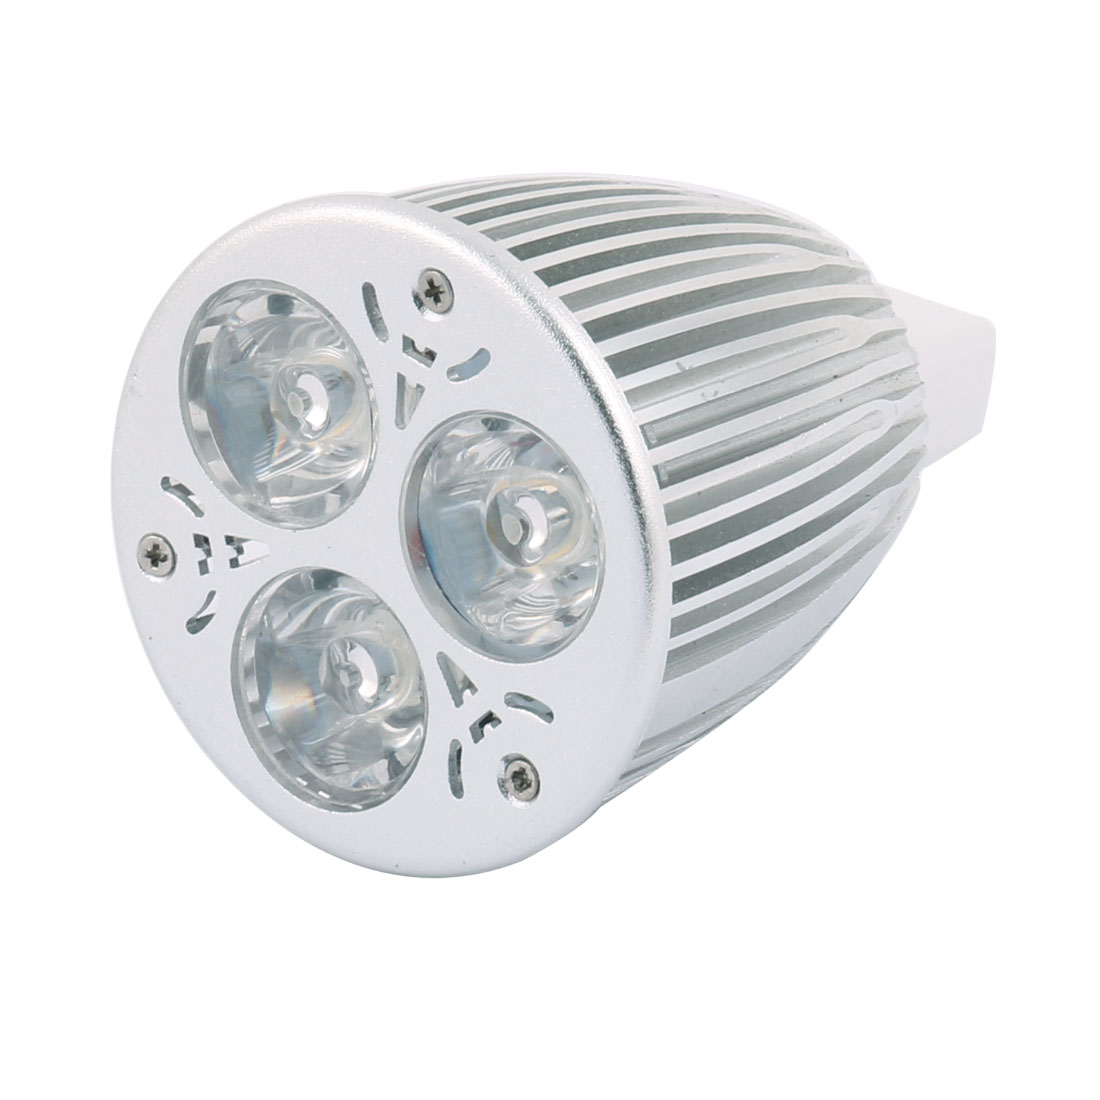 DC 12V 9W MR16 3 LEDs Ultra Bright COB Spotlight Bulb Energy Saving Downlight Warm White